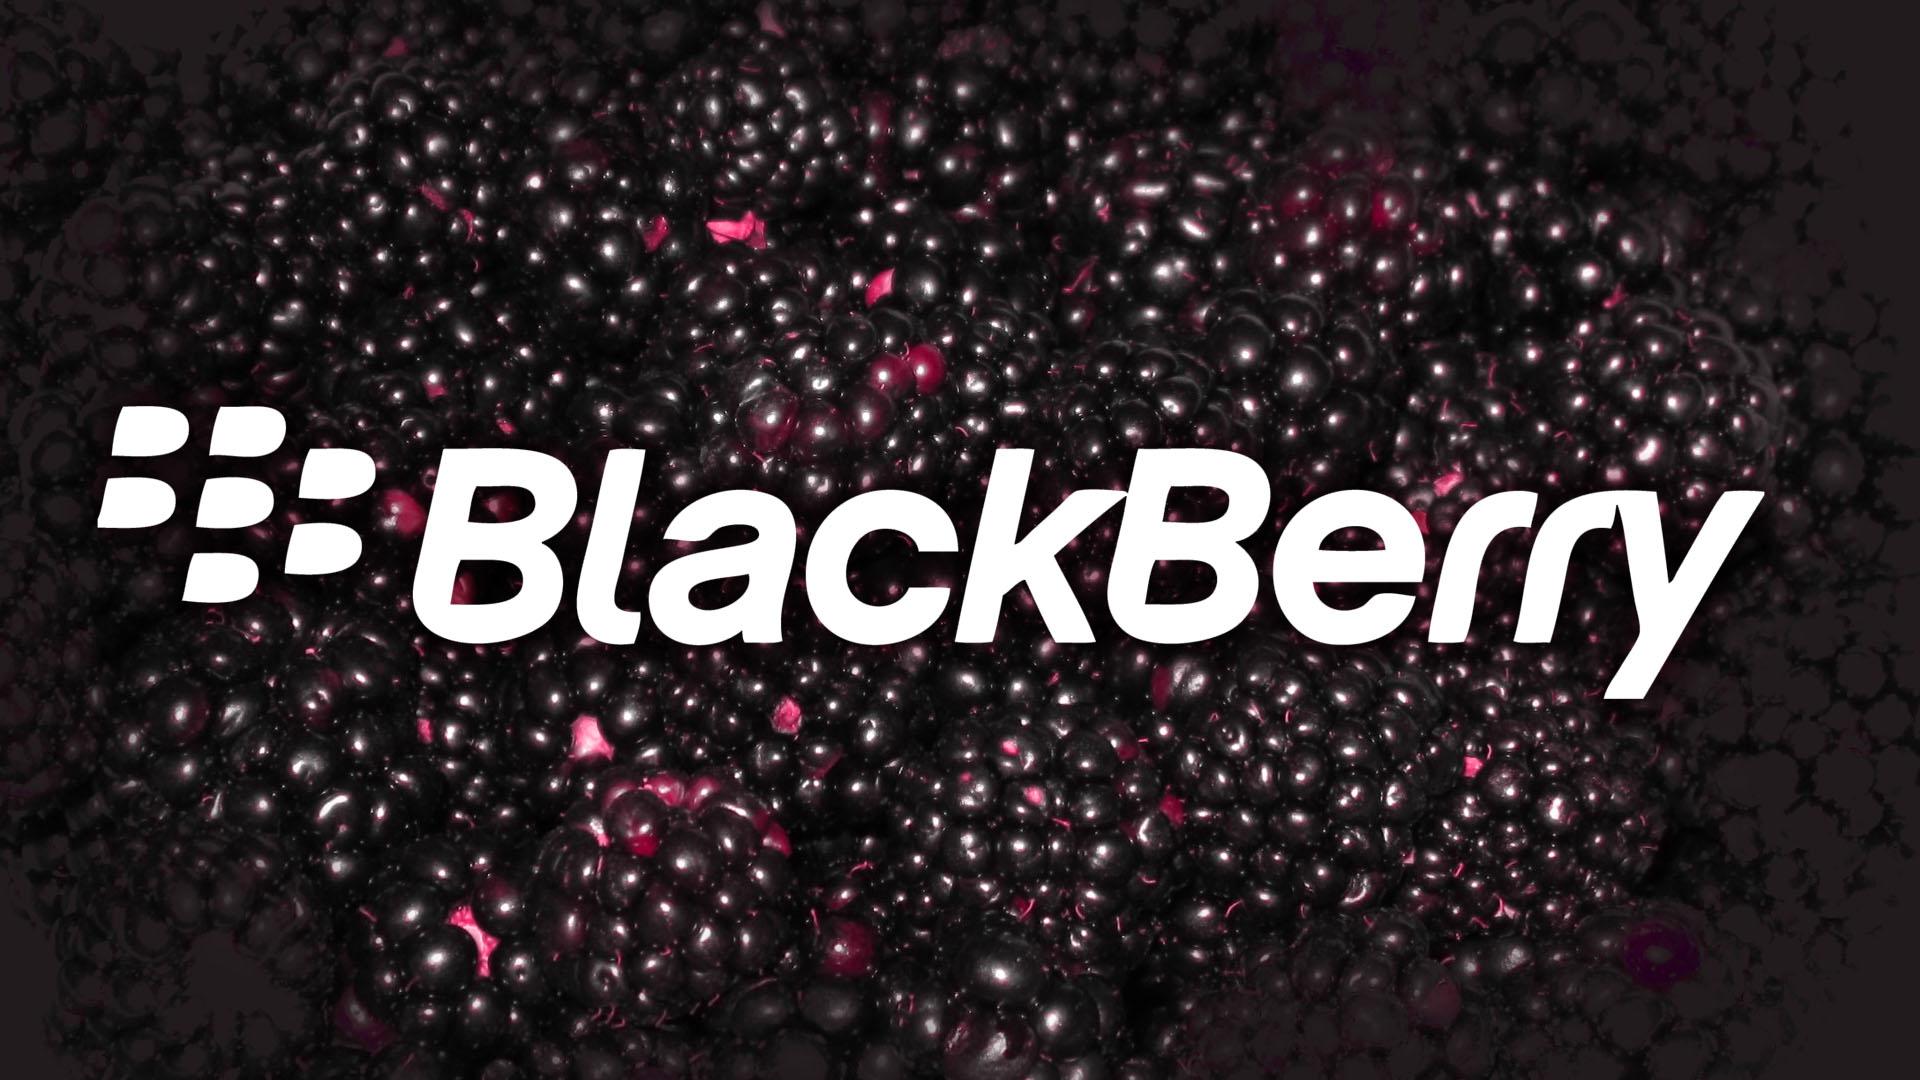 50+] BlackBerry Wallpaper Downloads on WallpaperSafari